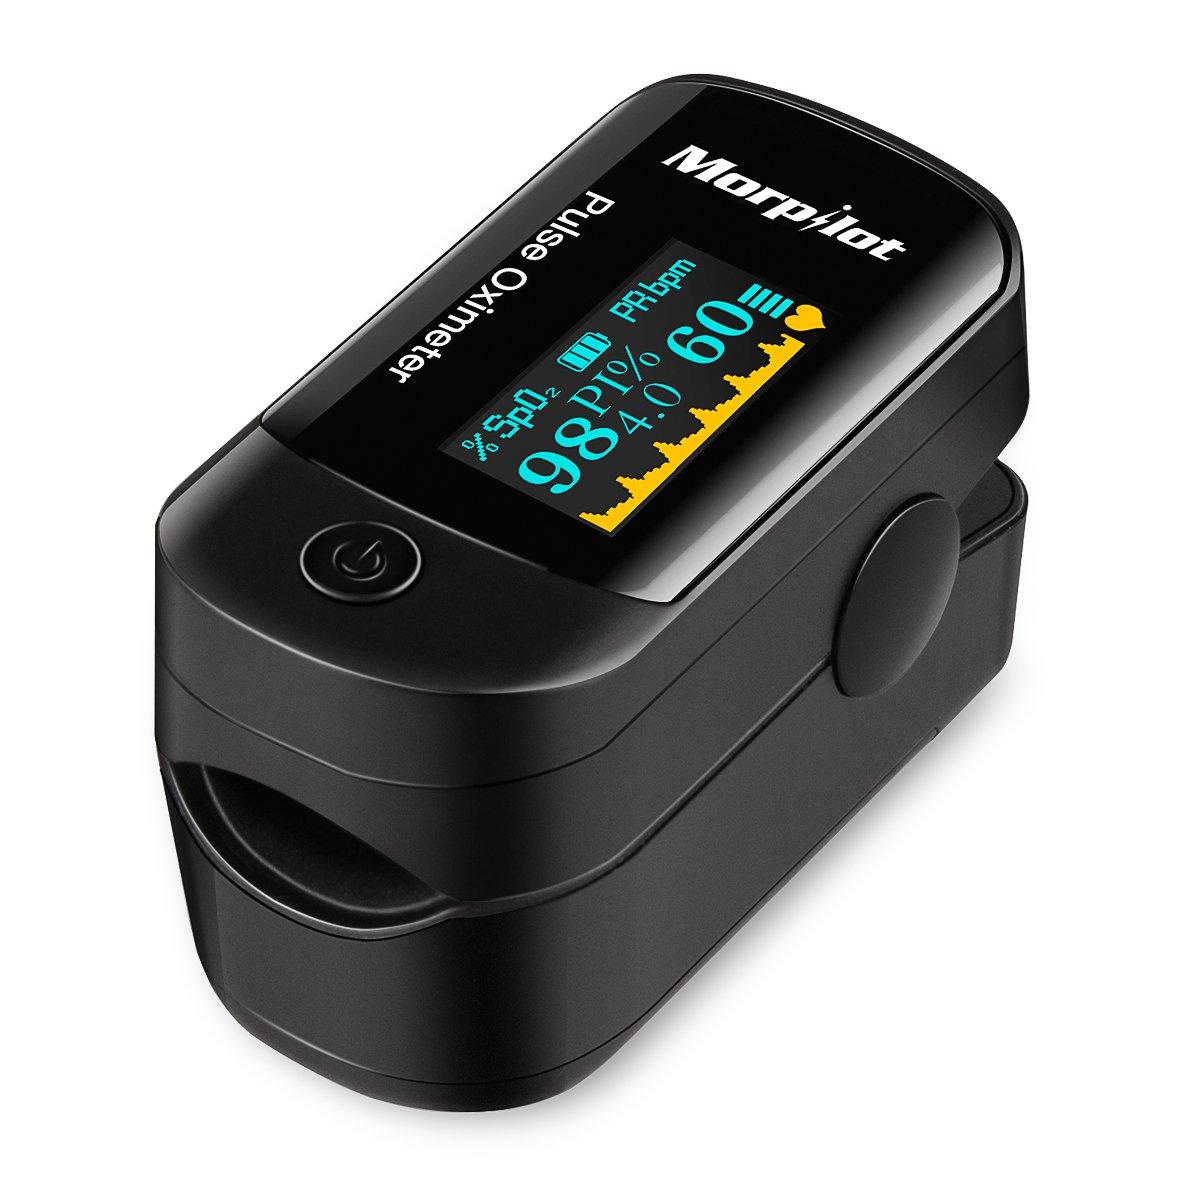 Oxímetro de pulso Oxímetro de dedo Morpilot OLED monitor digital de la